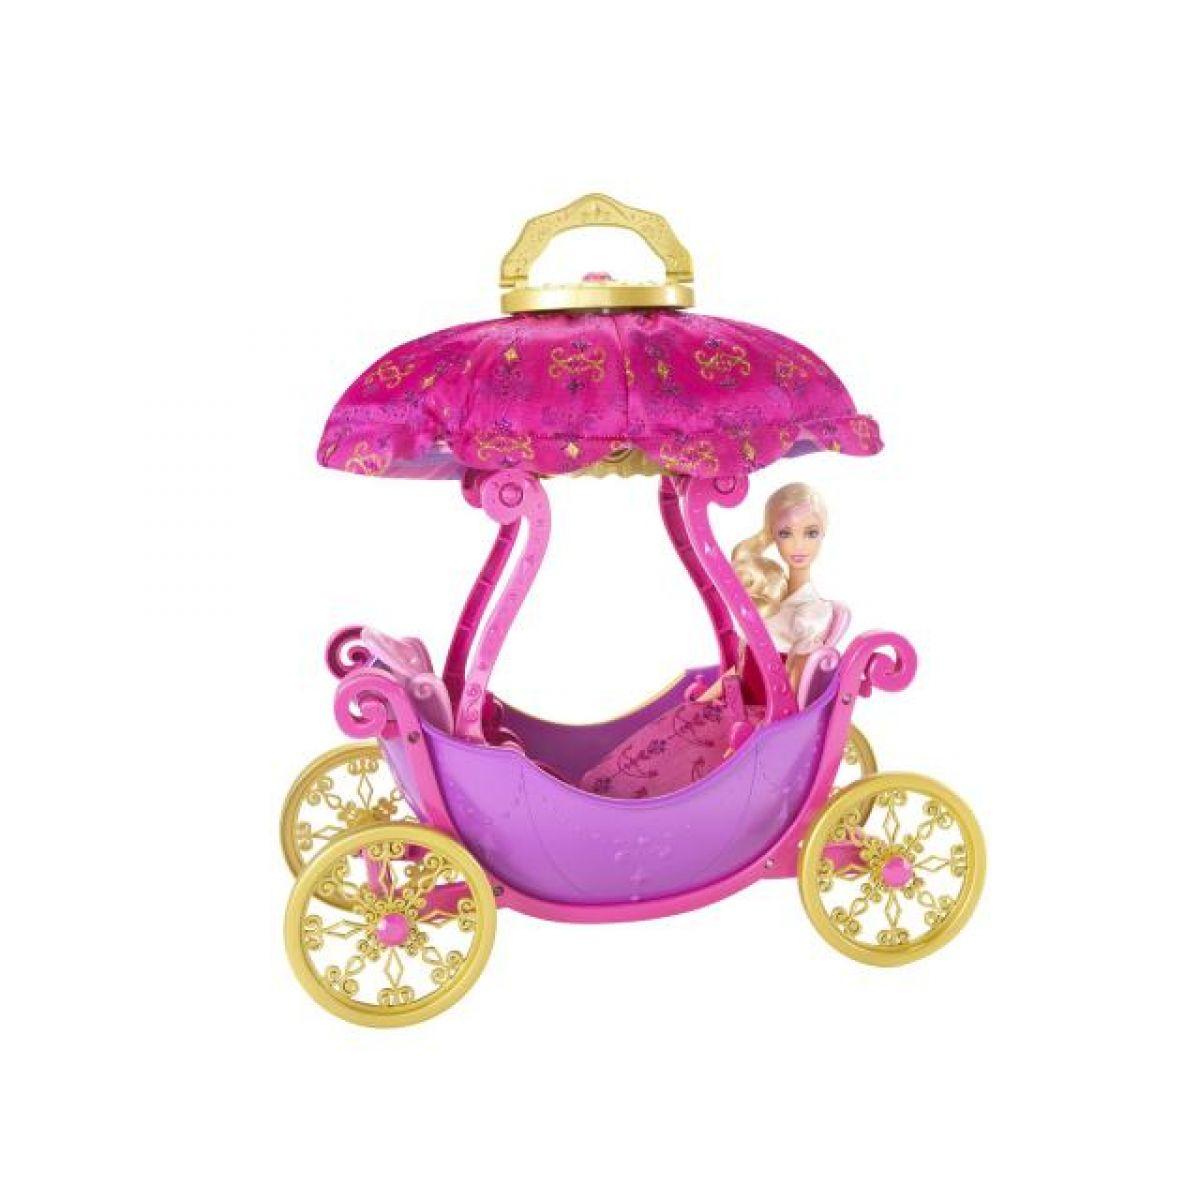 Barbie P9076 - Barbie Tři mušketýři - kočár + bonus panenka zdarma